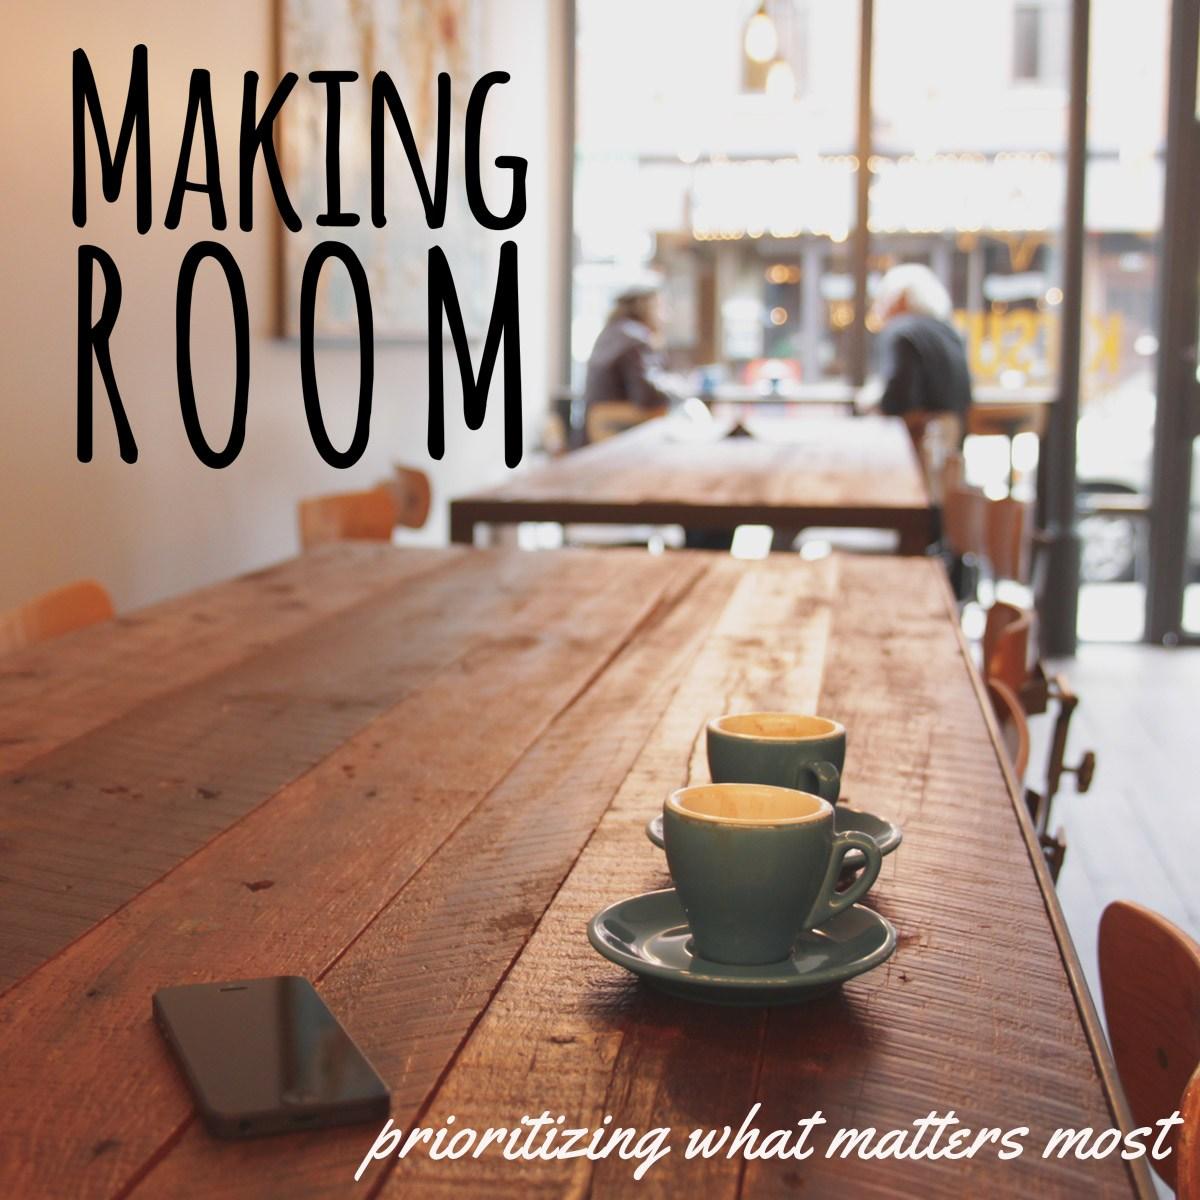 Making Room.jpg